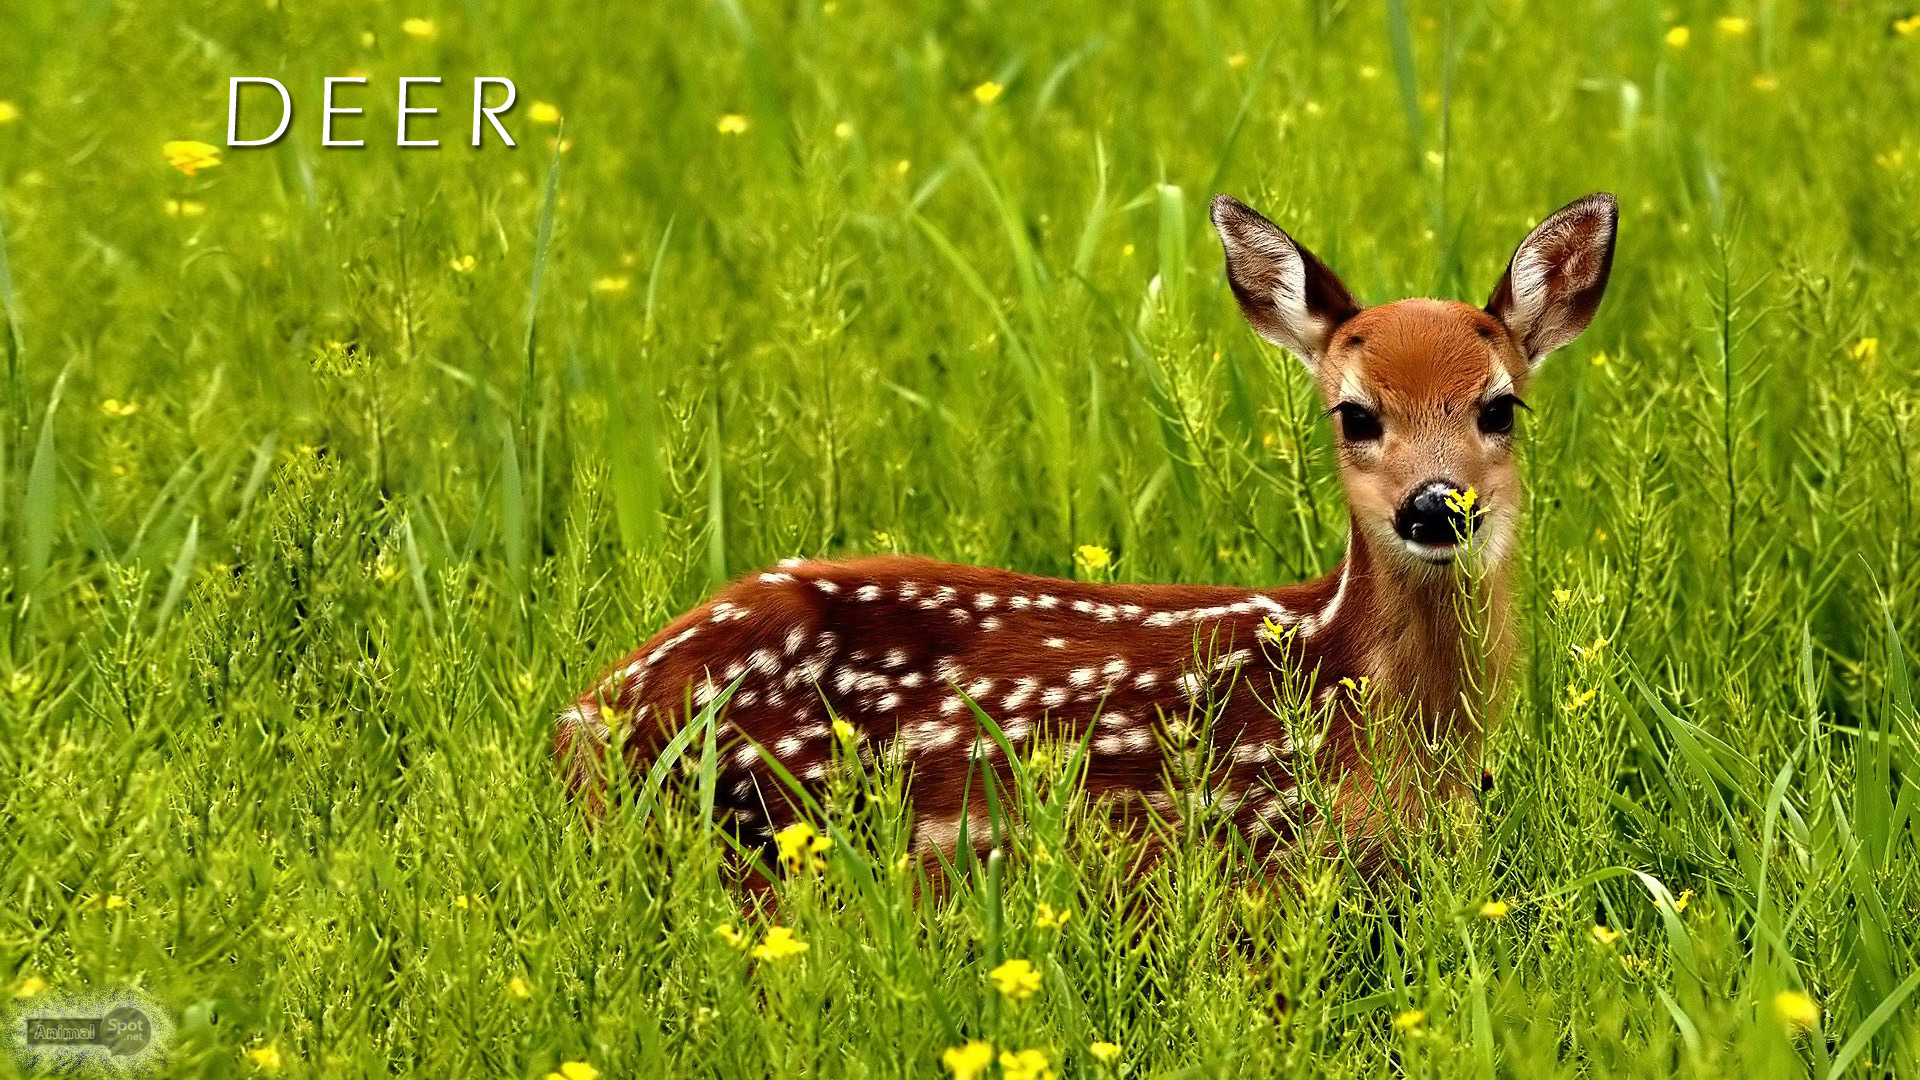 Deer Wallpaper 43 Wallpapers Hd Wallpapers HD Wallpapers Download Free Images Wallpaper [1000image.com]